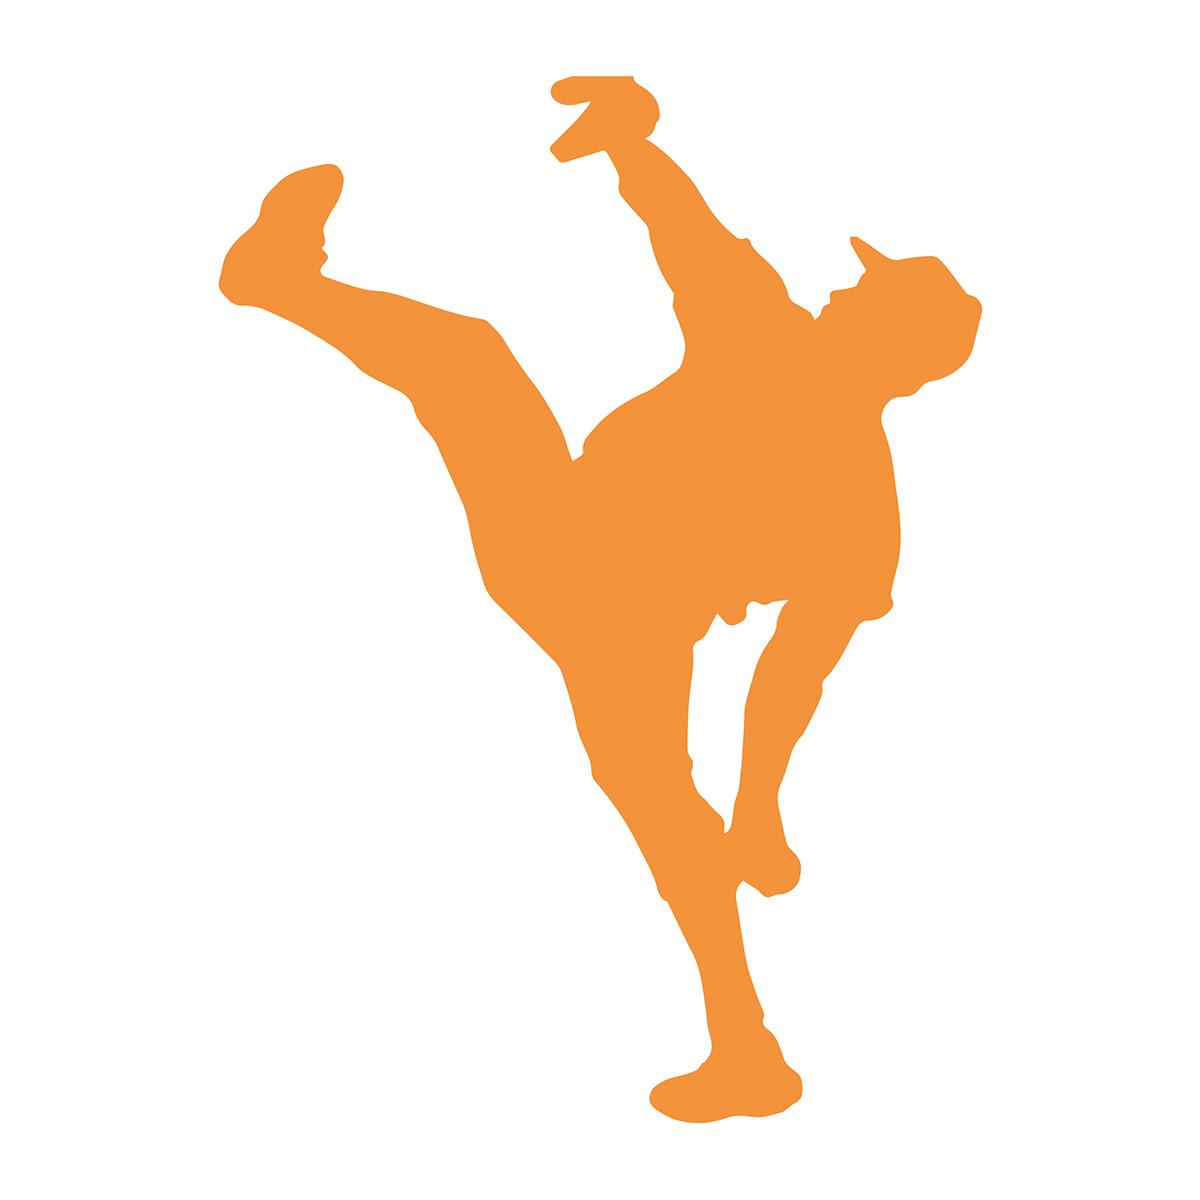 Silhouette of baseball player kicking leg